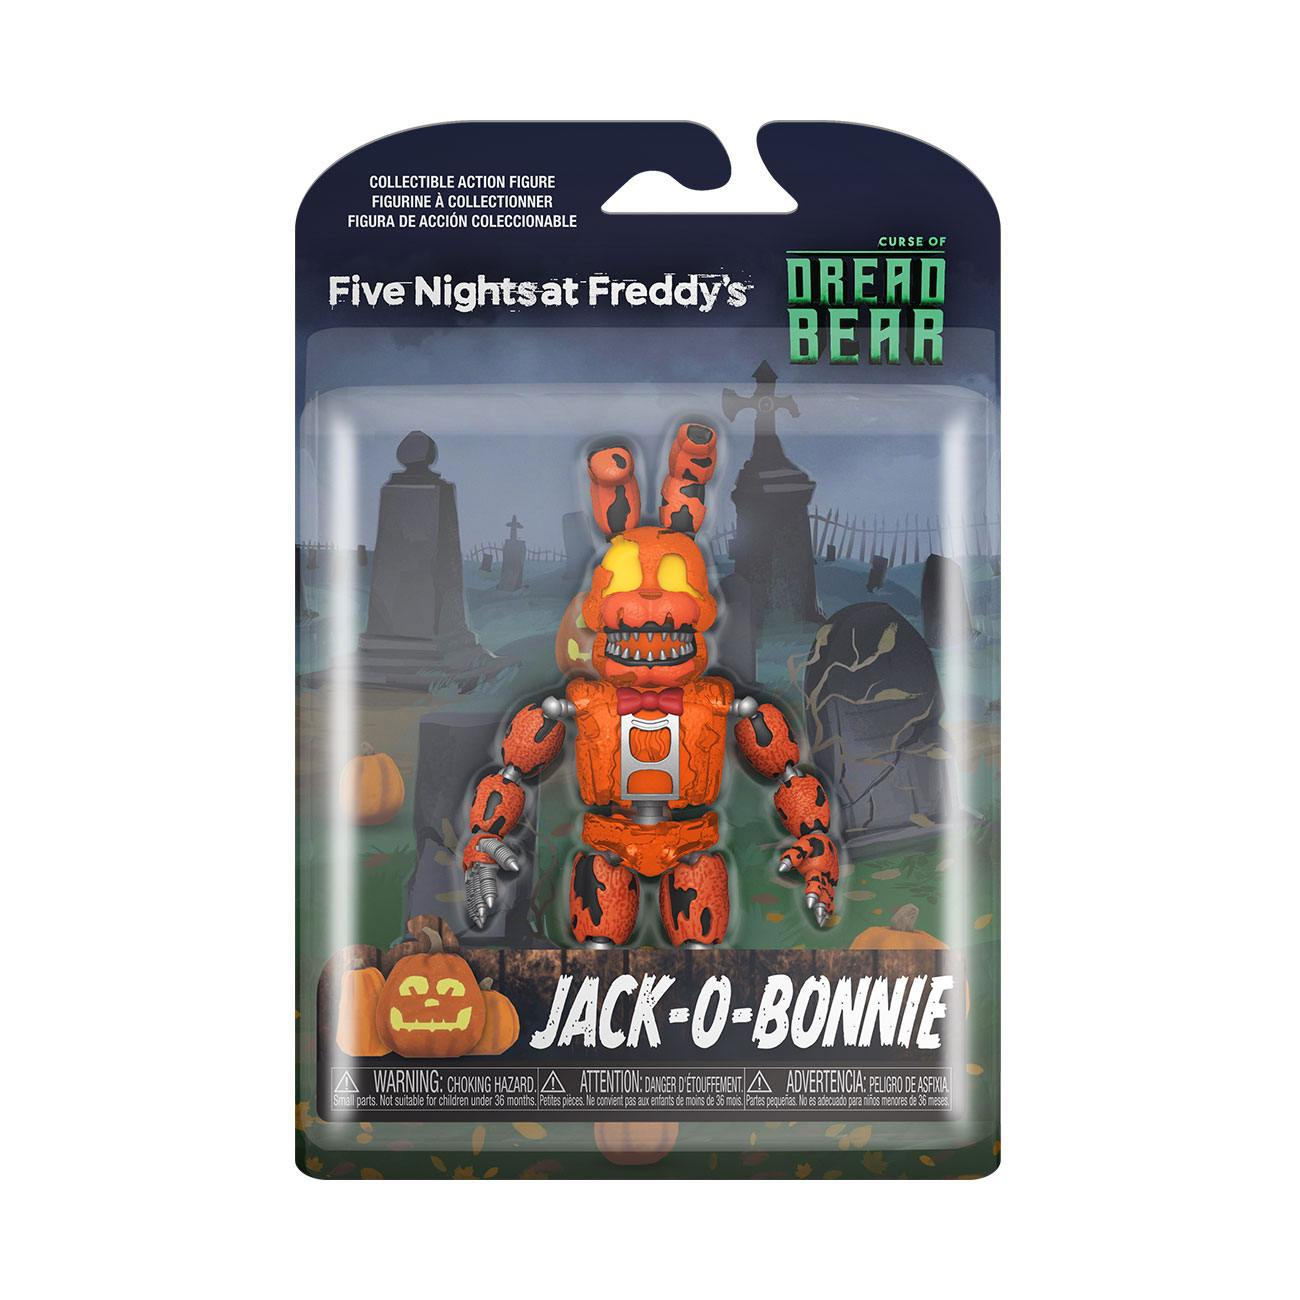 Five Nights at Freddy's Dreadbear Action Figure Jack-o-Bonnie 13 cm